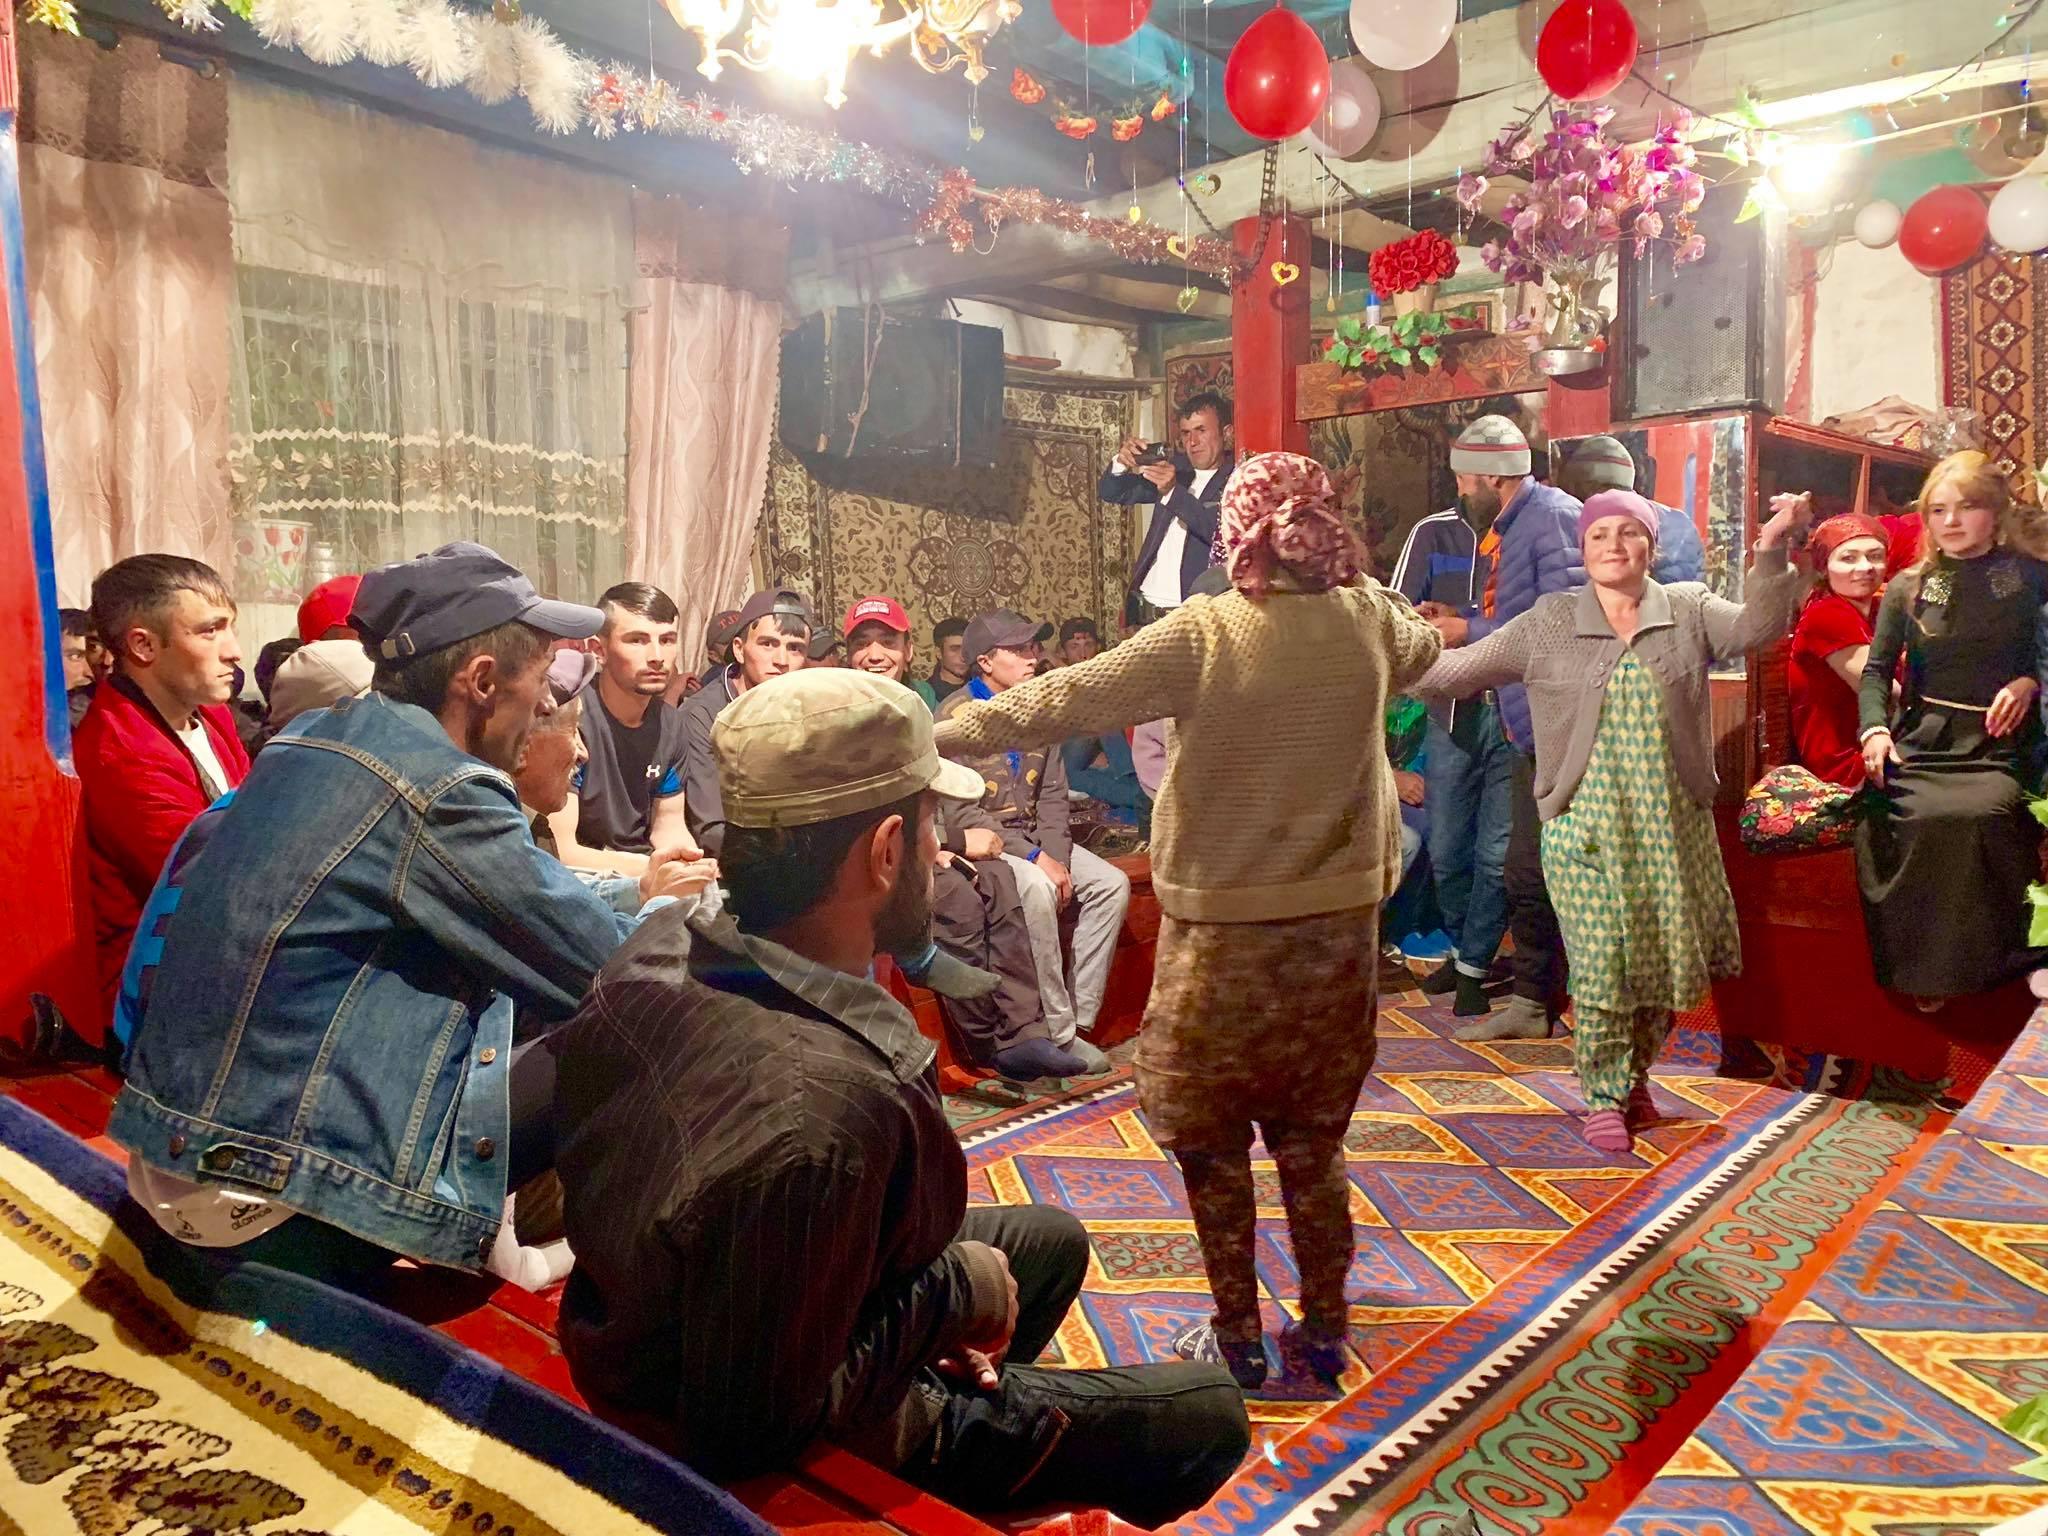 Kach Solo Travels in 2019 Experiencing a Traditional Wakhan Wedding in Tajikistan4.jpg